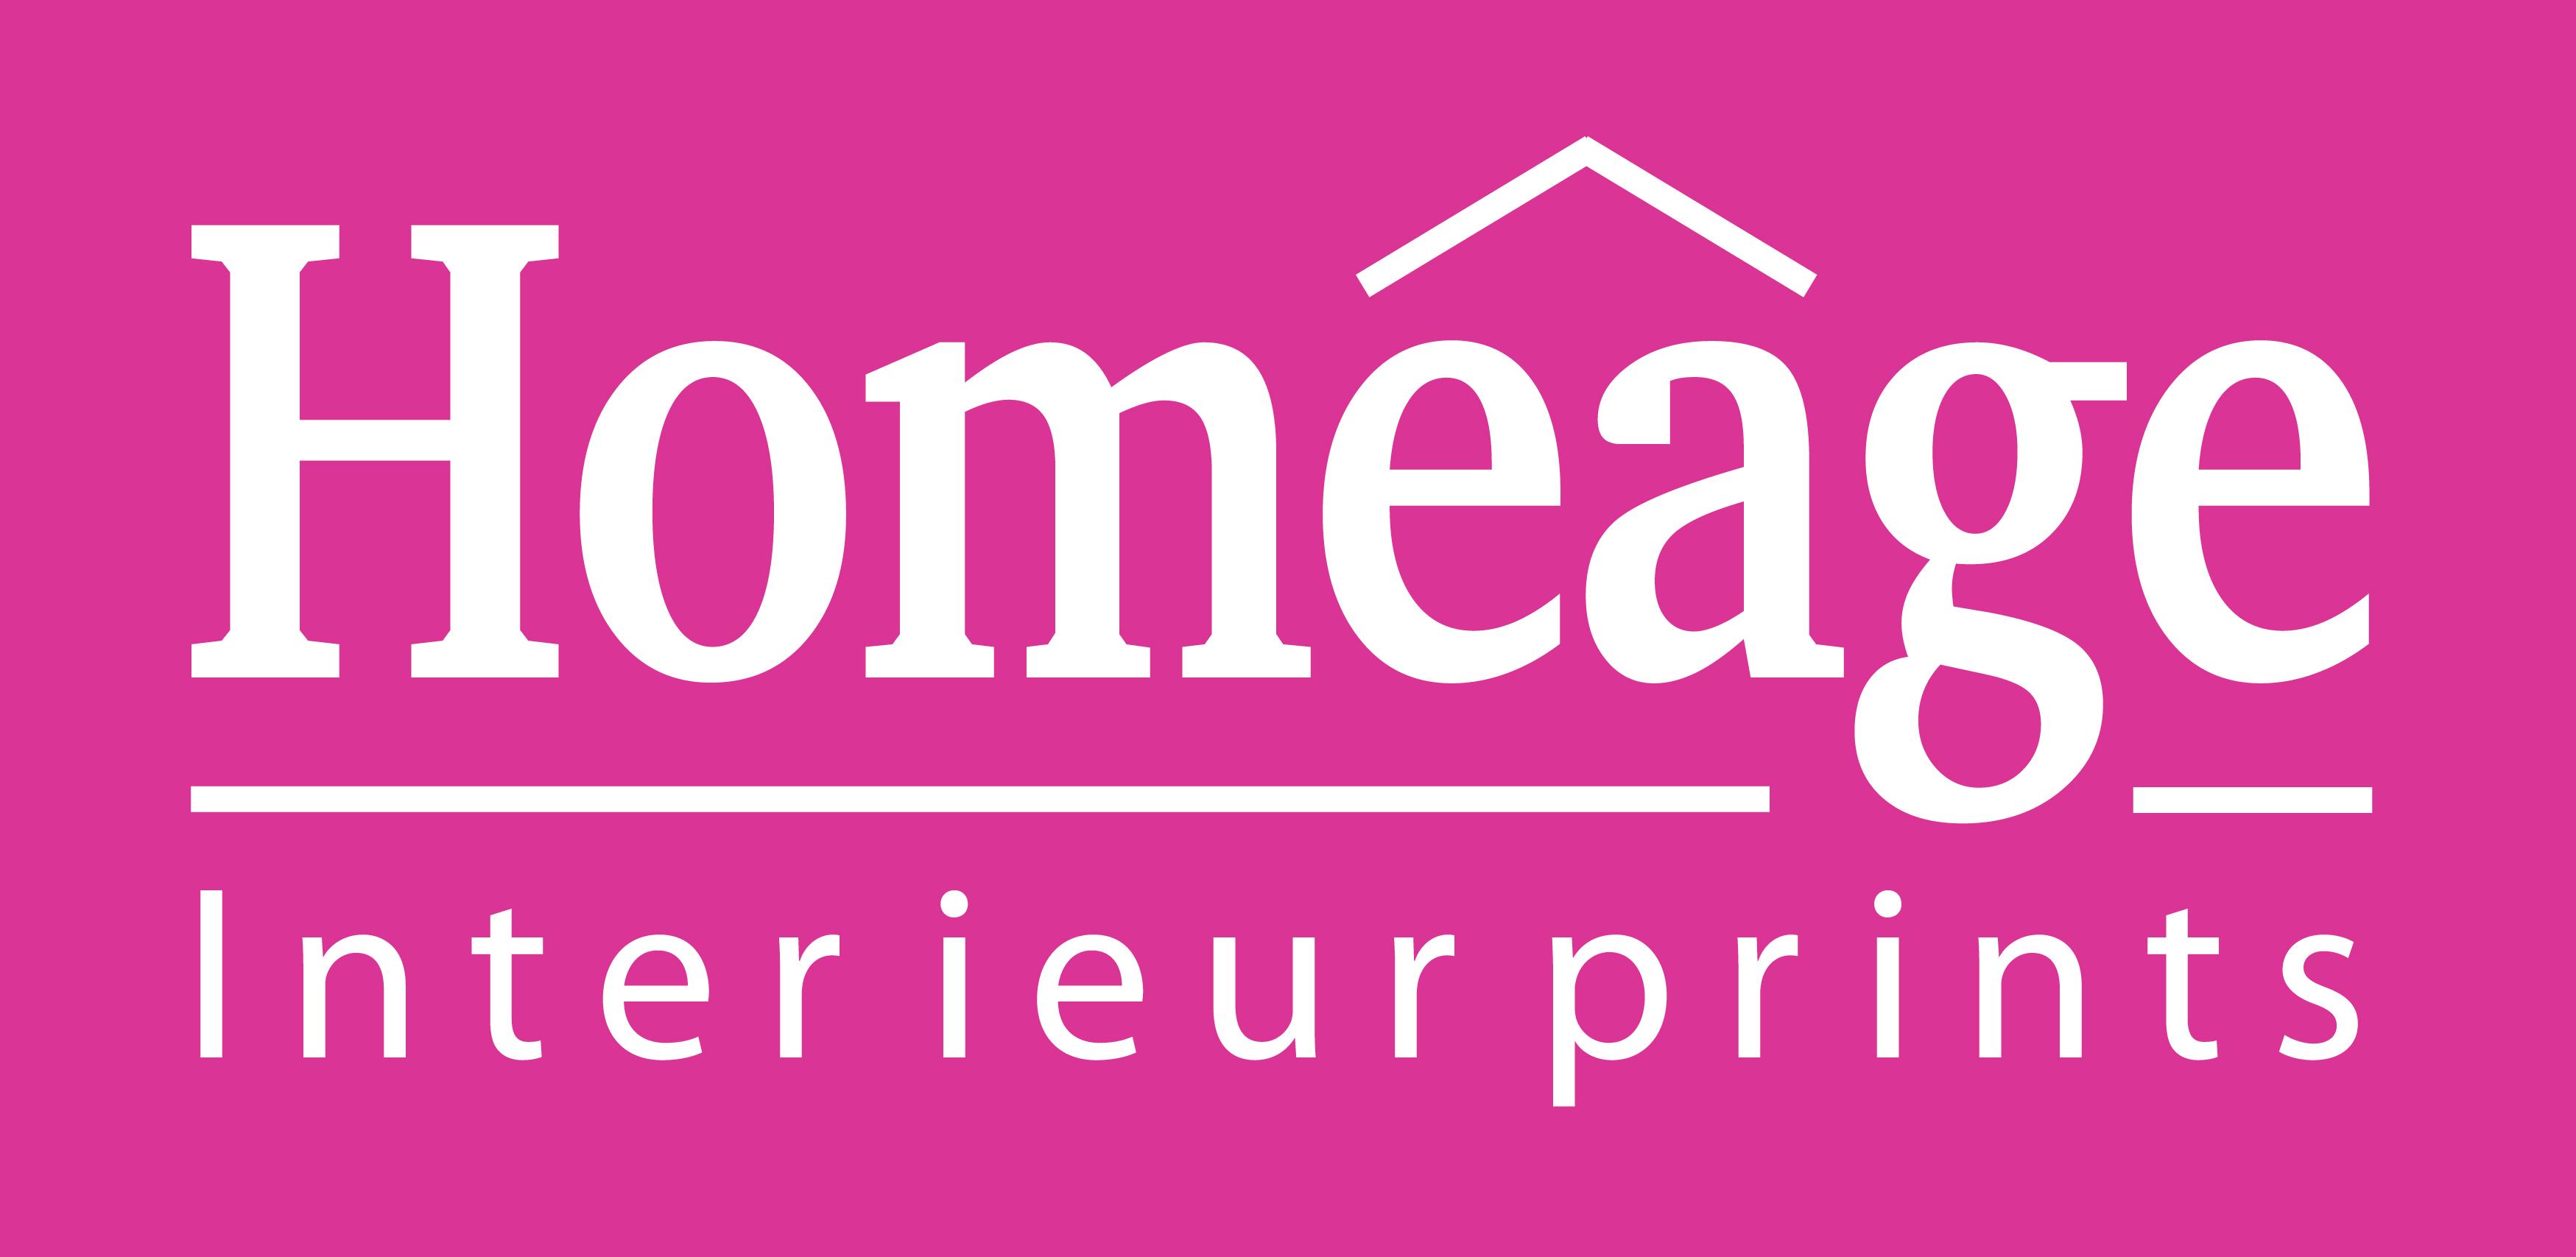 homeage logo definitief roze